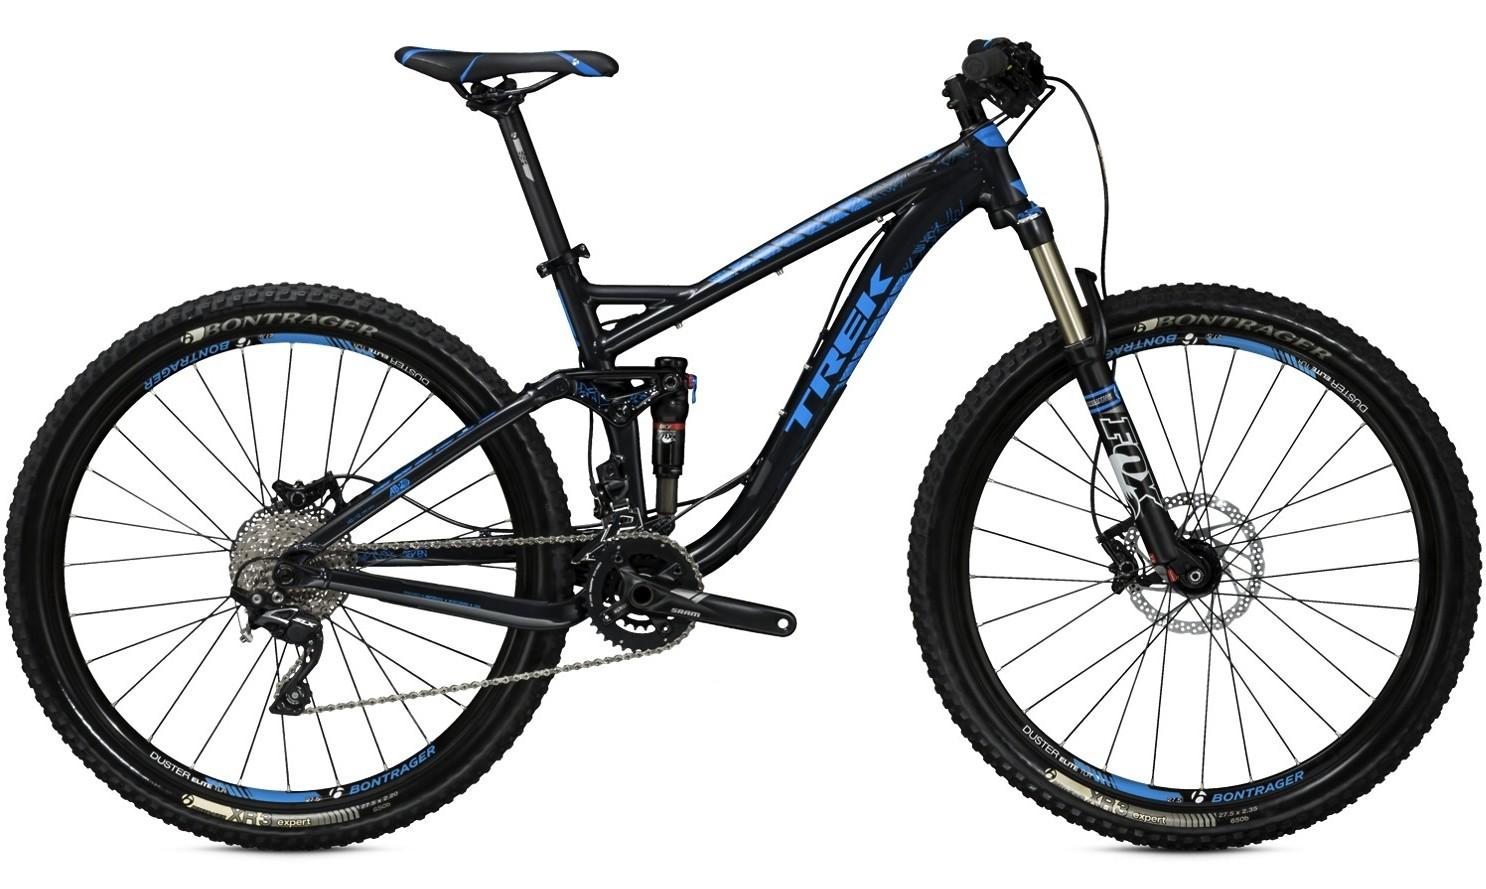 2015 Trek Fuel EX 7 27.5